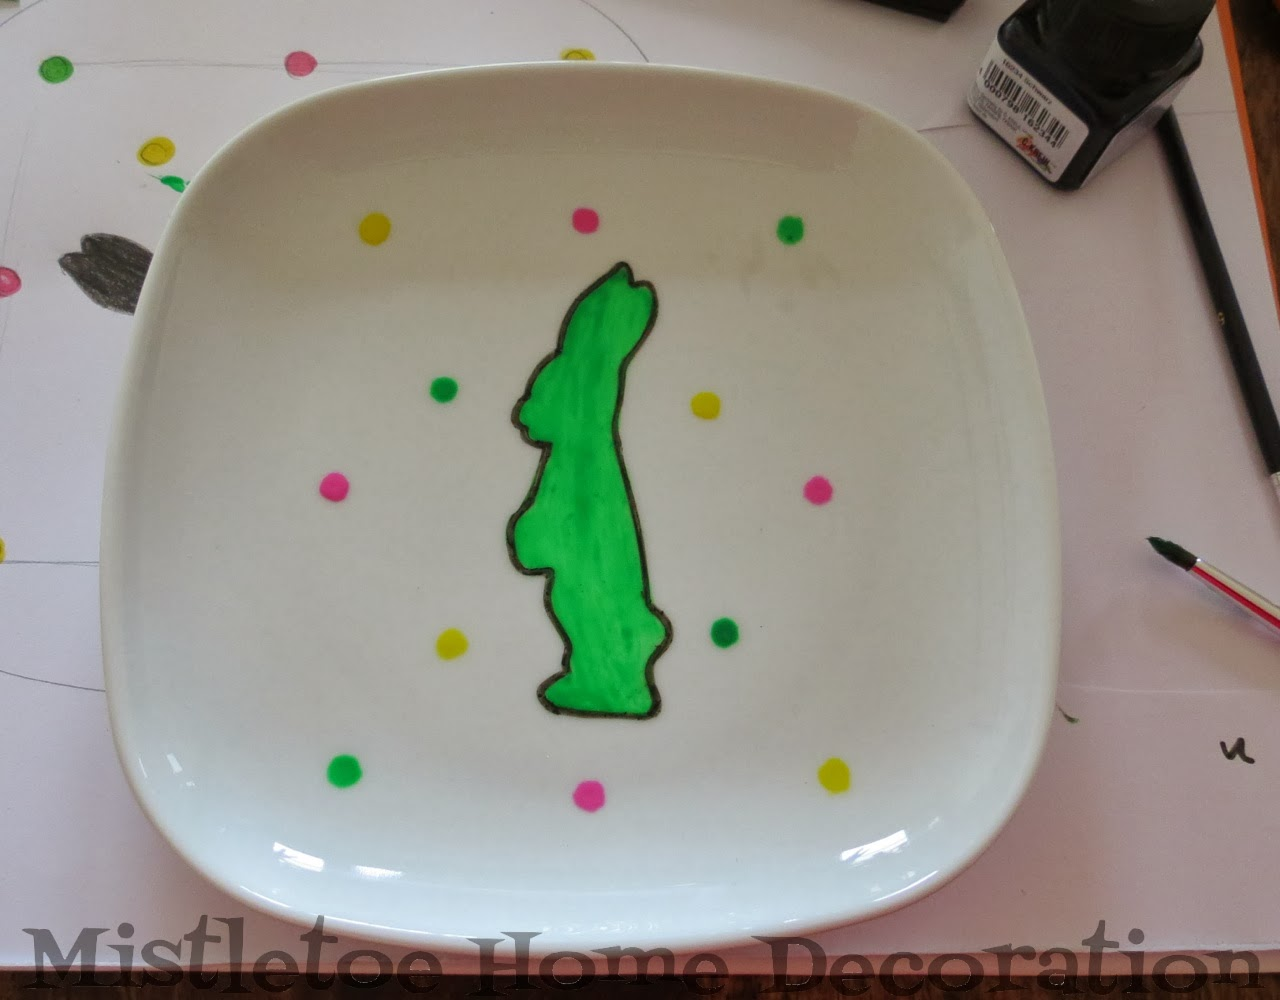 Mistletoe Home Designs: DIY porcelain painting